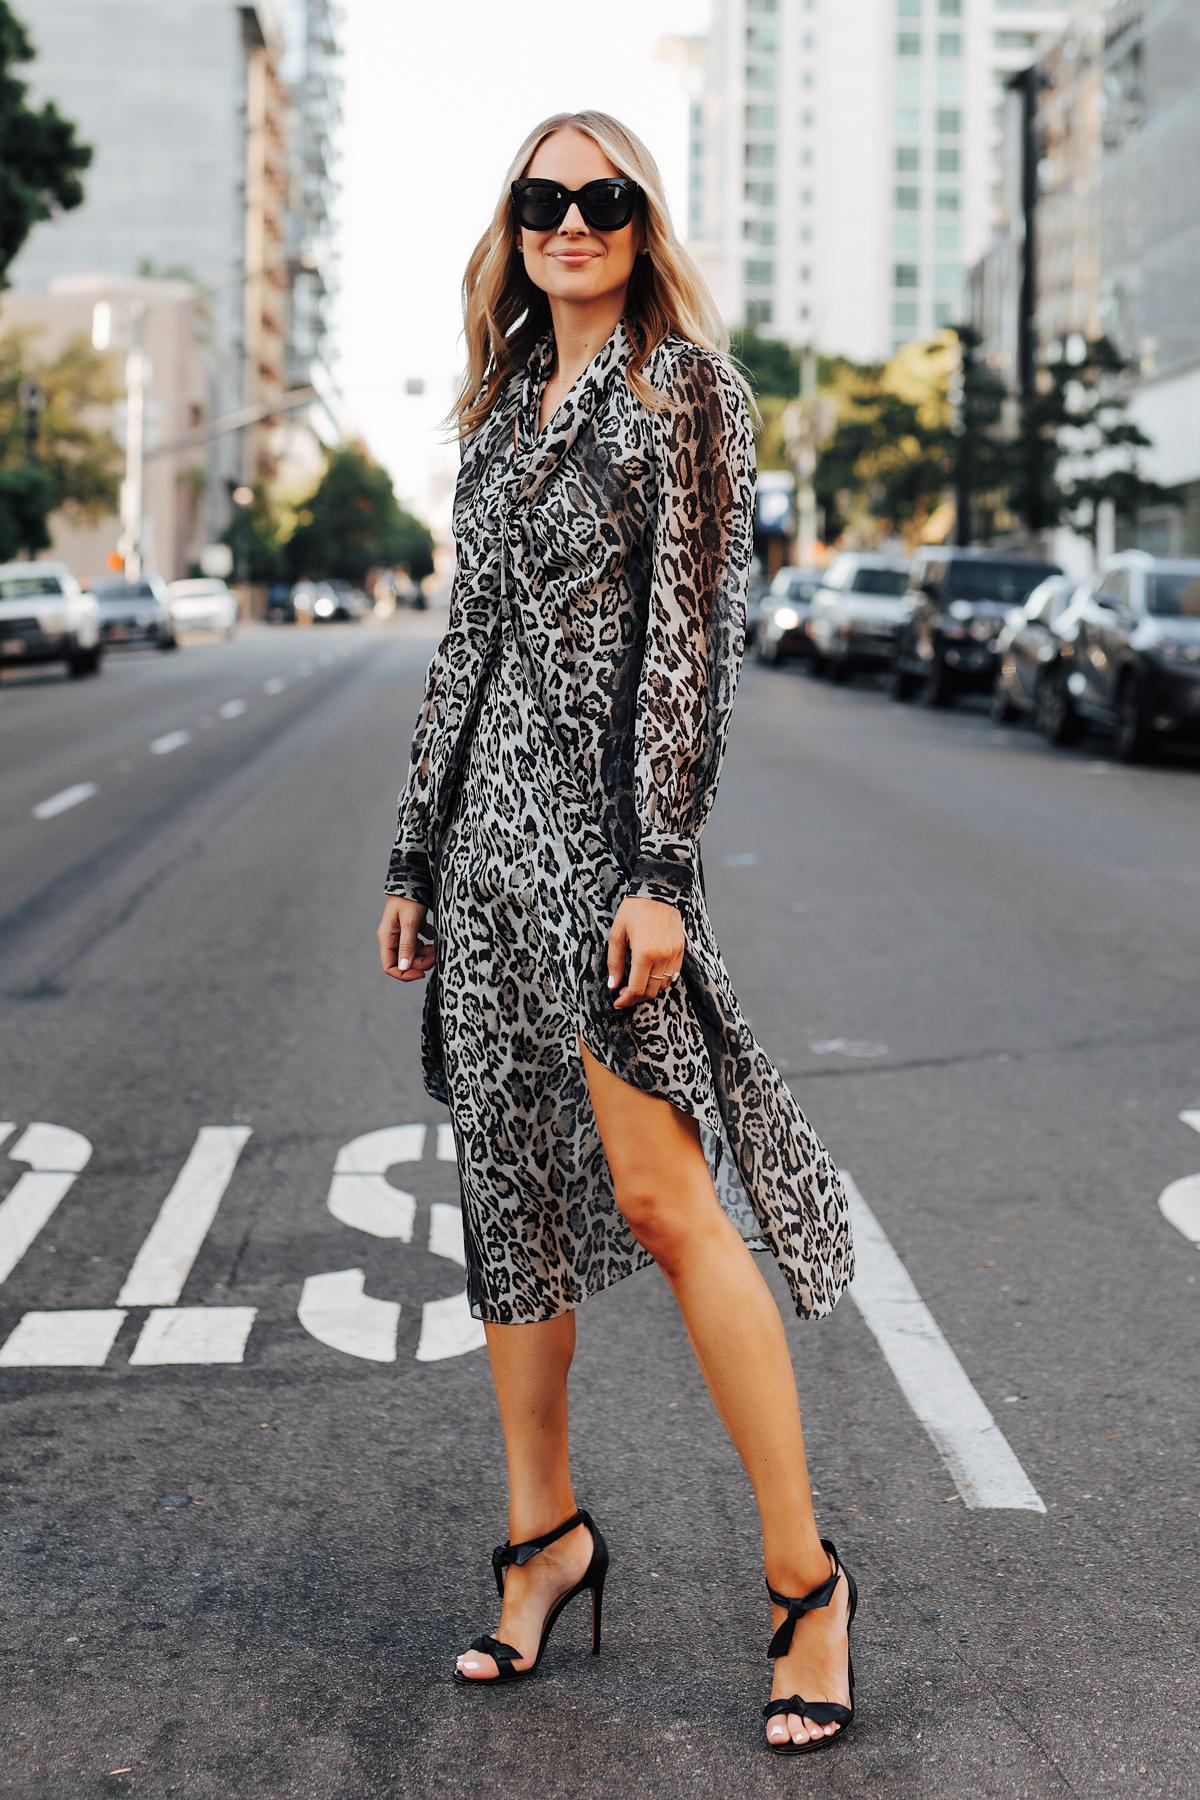 Fashion Jackson Wearing tommy hilfiger zendaya collection snow leopard dress Black Tie Heeled Sandals 3